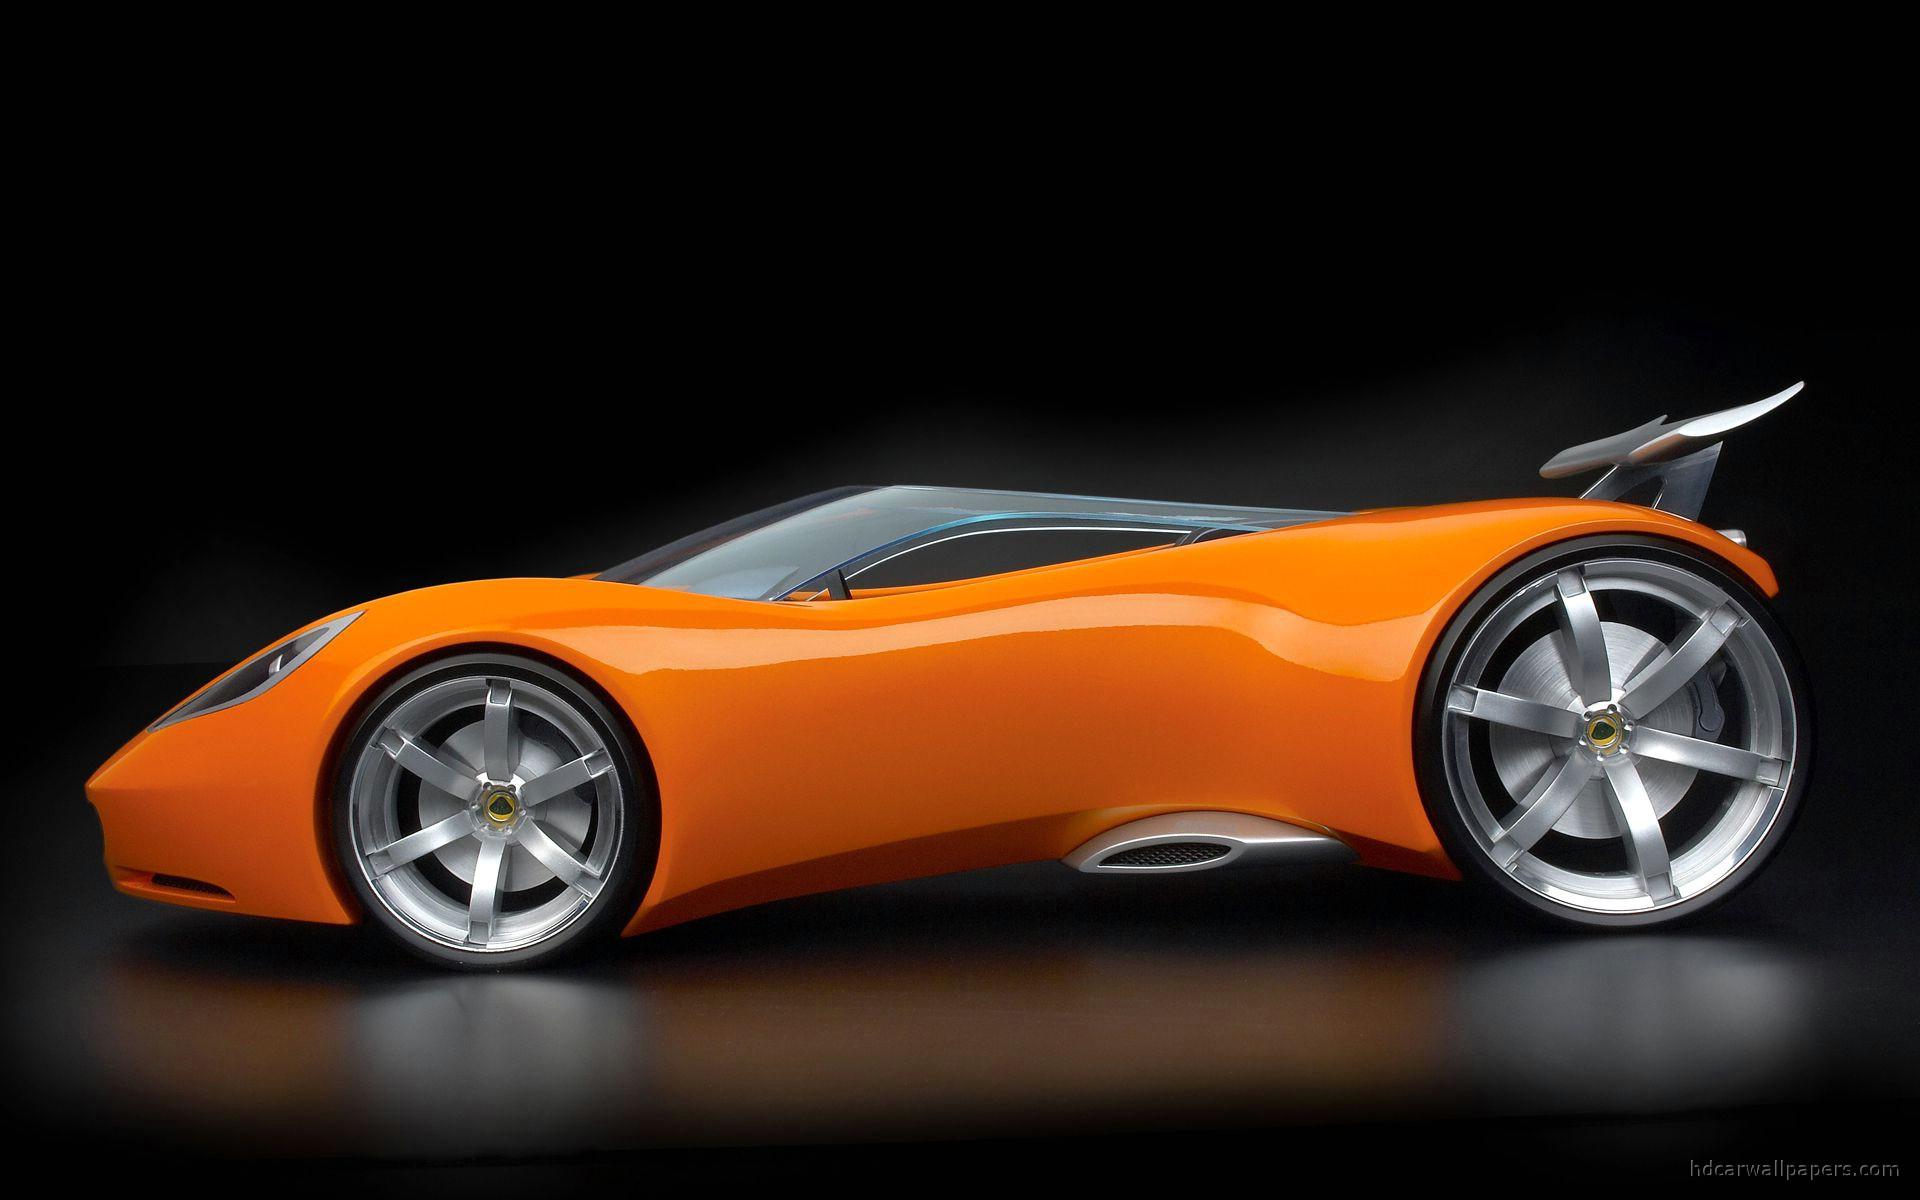 Lotus Hot Wheels Concept 4 Wallpaper | HD Car Wallpapers| ID #1597